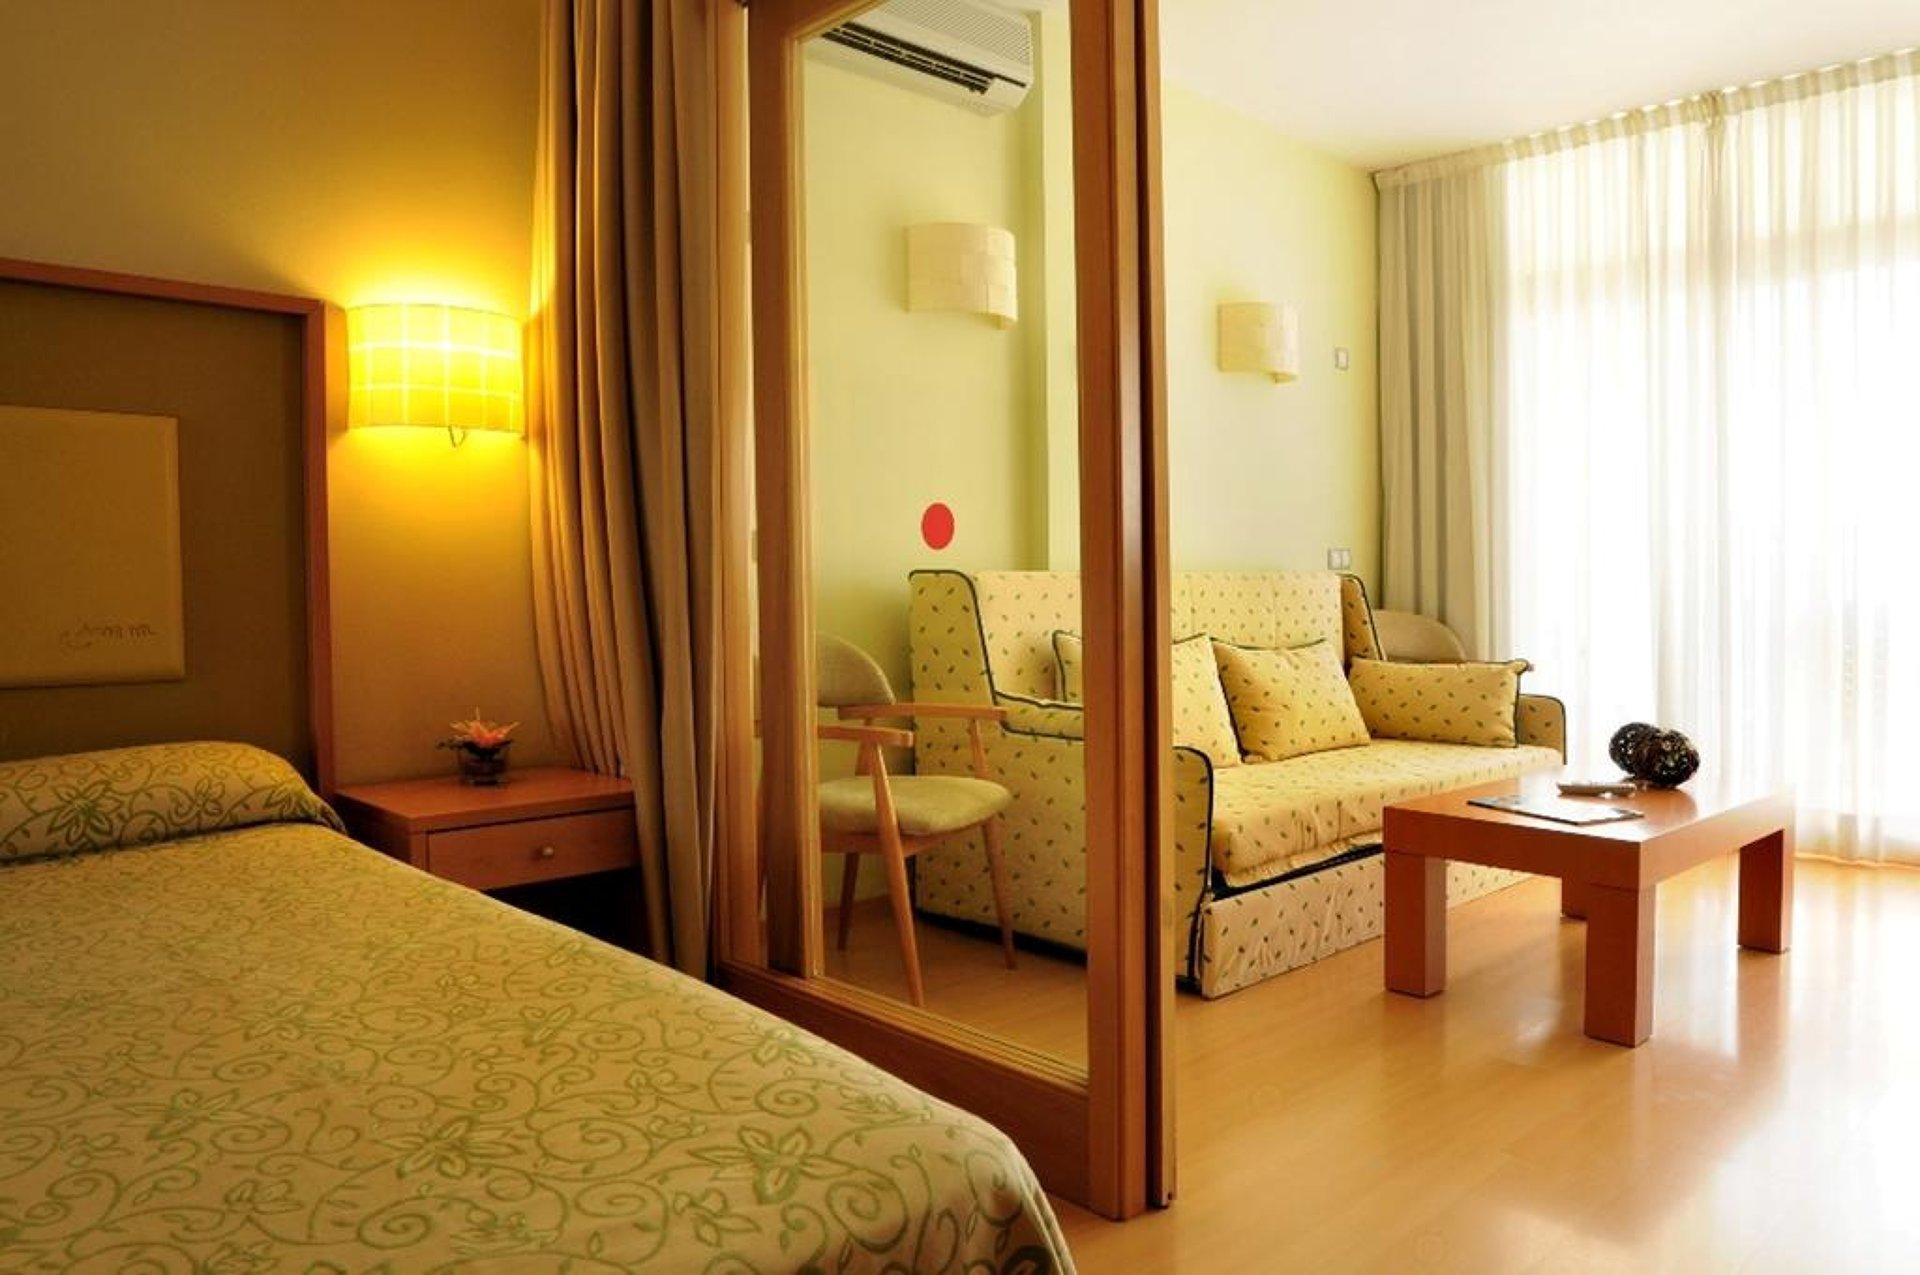 evenia olympic suites encuentra tu hotel de vacaciones. Black Bedroom Furniture Sets. Home Design Ideas